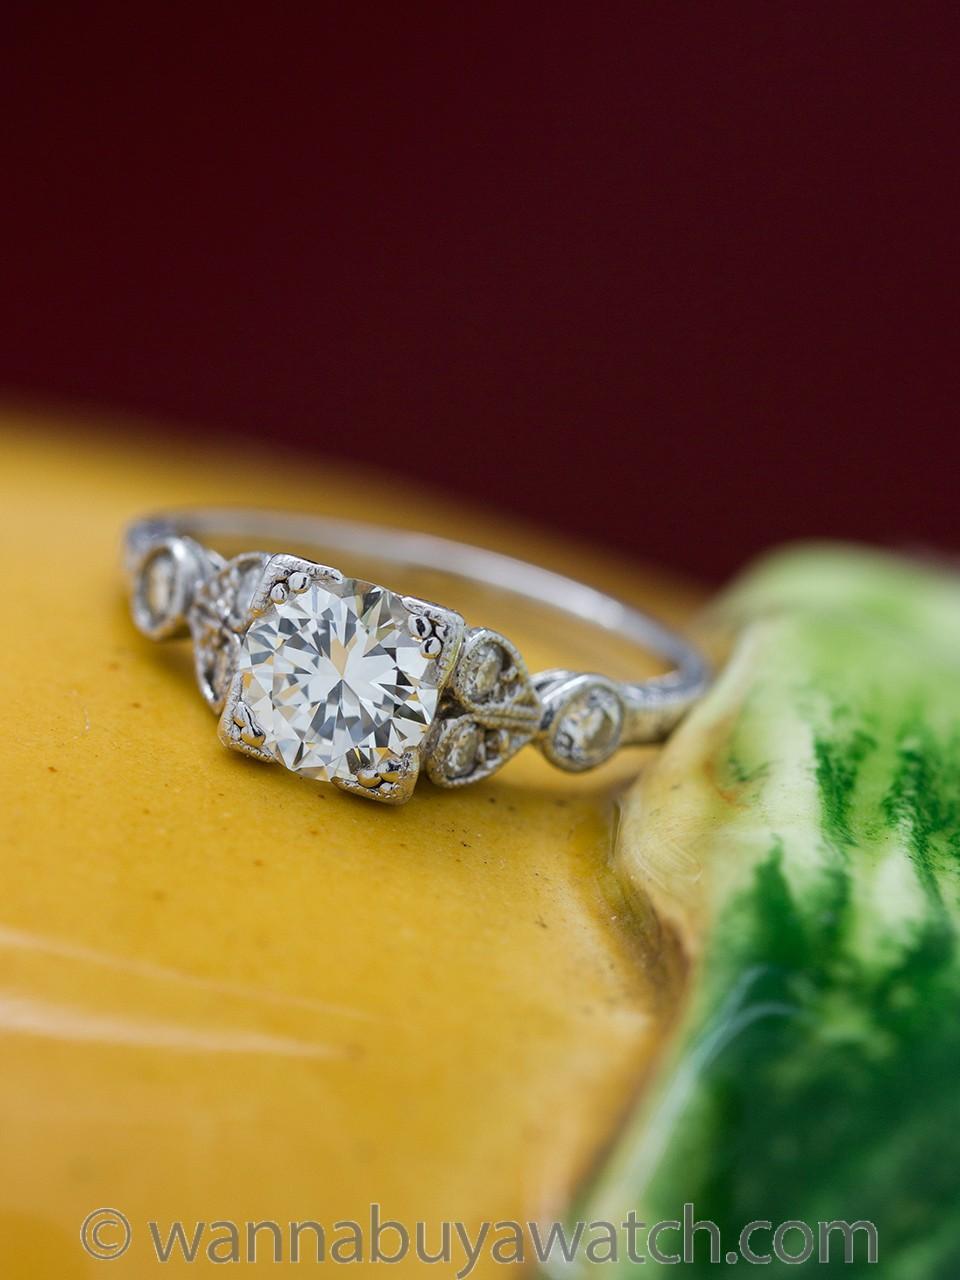 Vintage Style Engraved Engagement Ring Platinum 0.77ct F-VS2